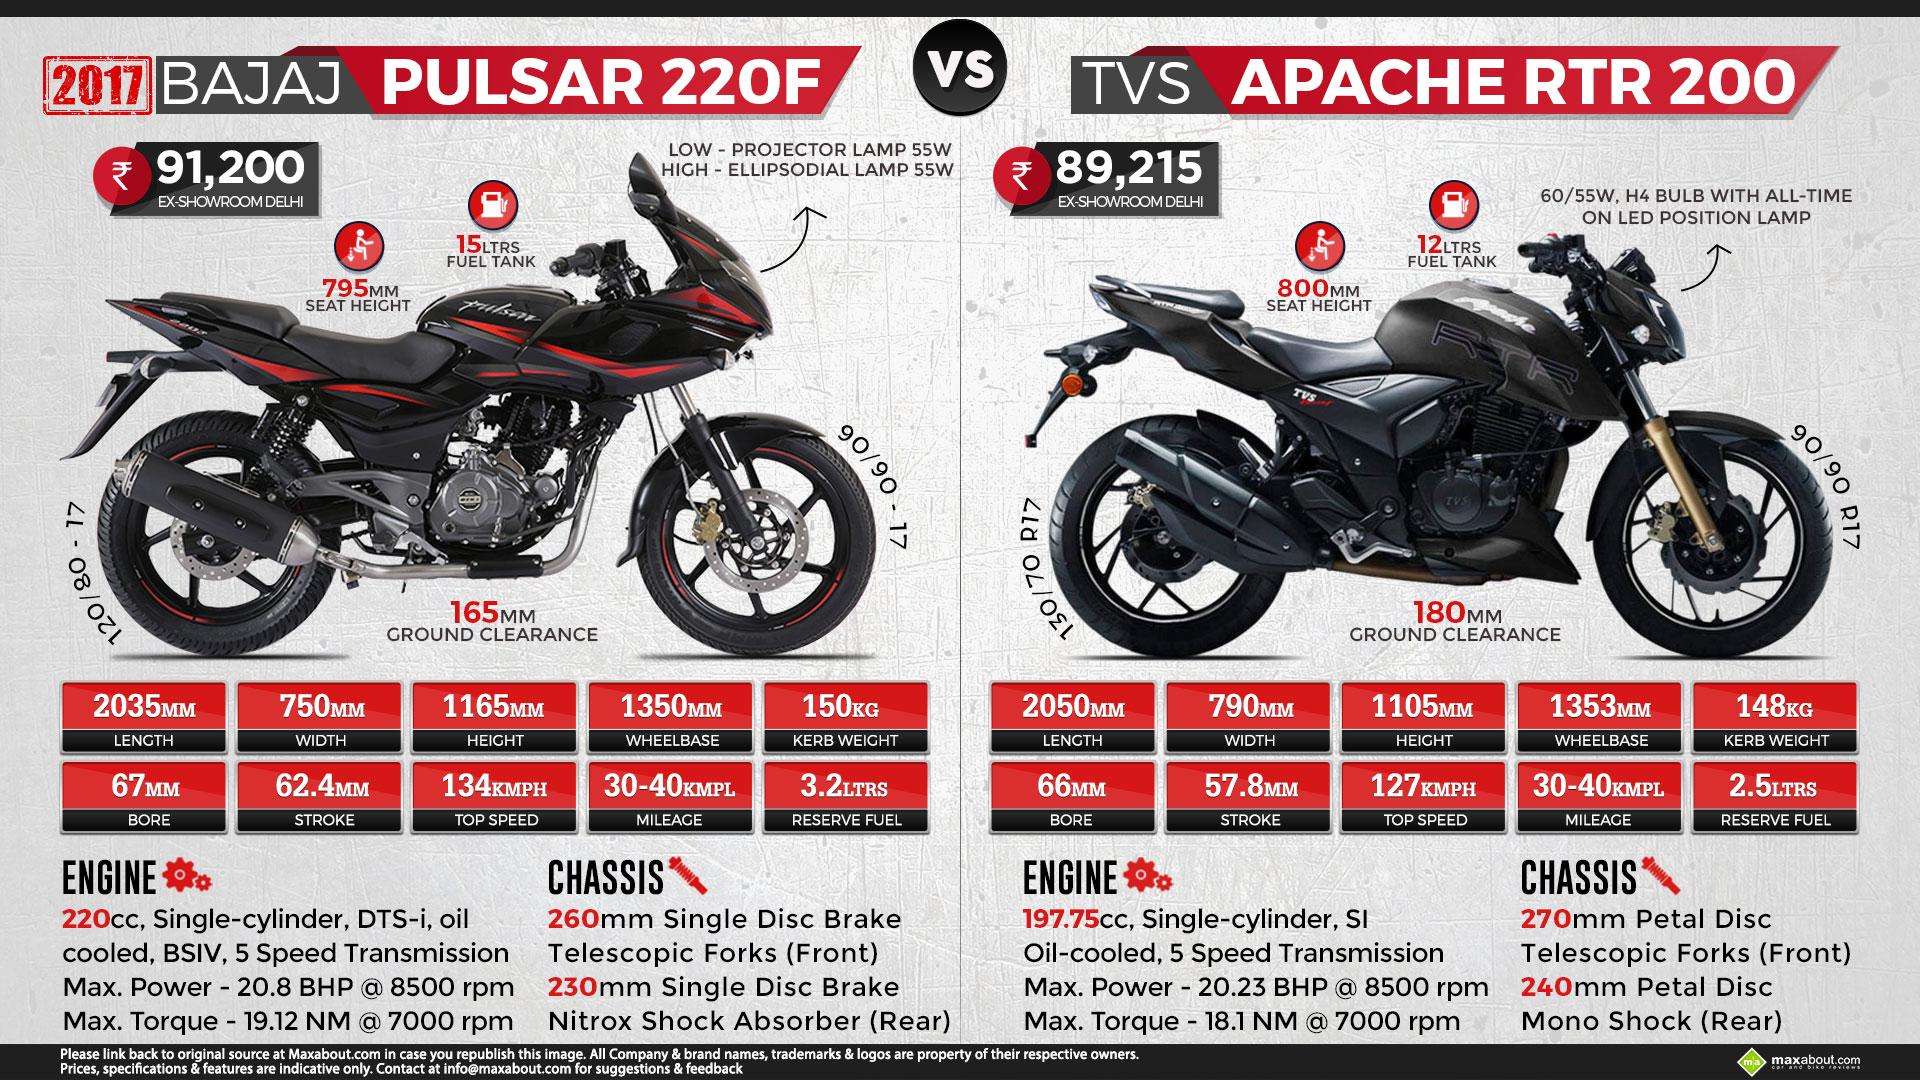 2017 Bajaj Pulsar 220F vs TVS Apache RTR 200 1920x1080